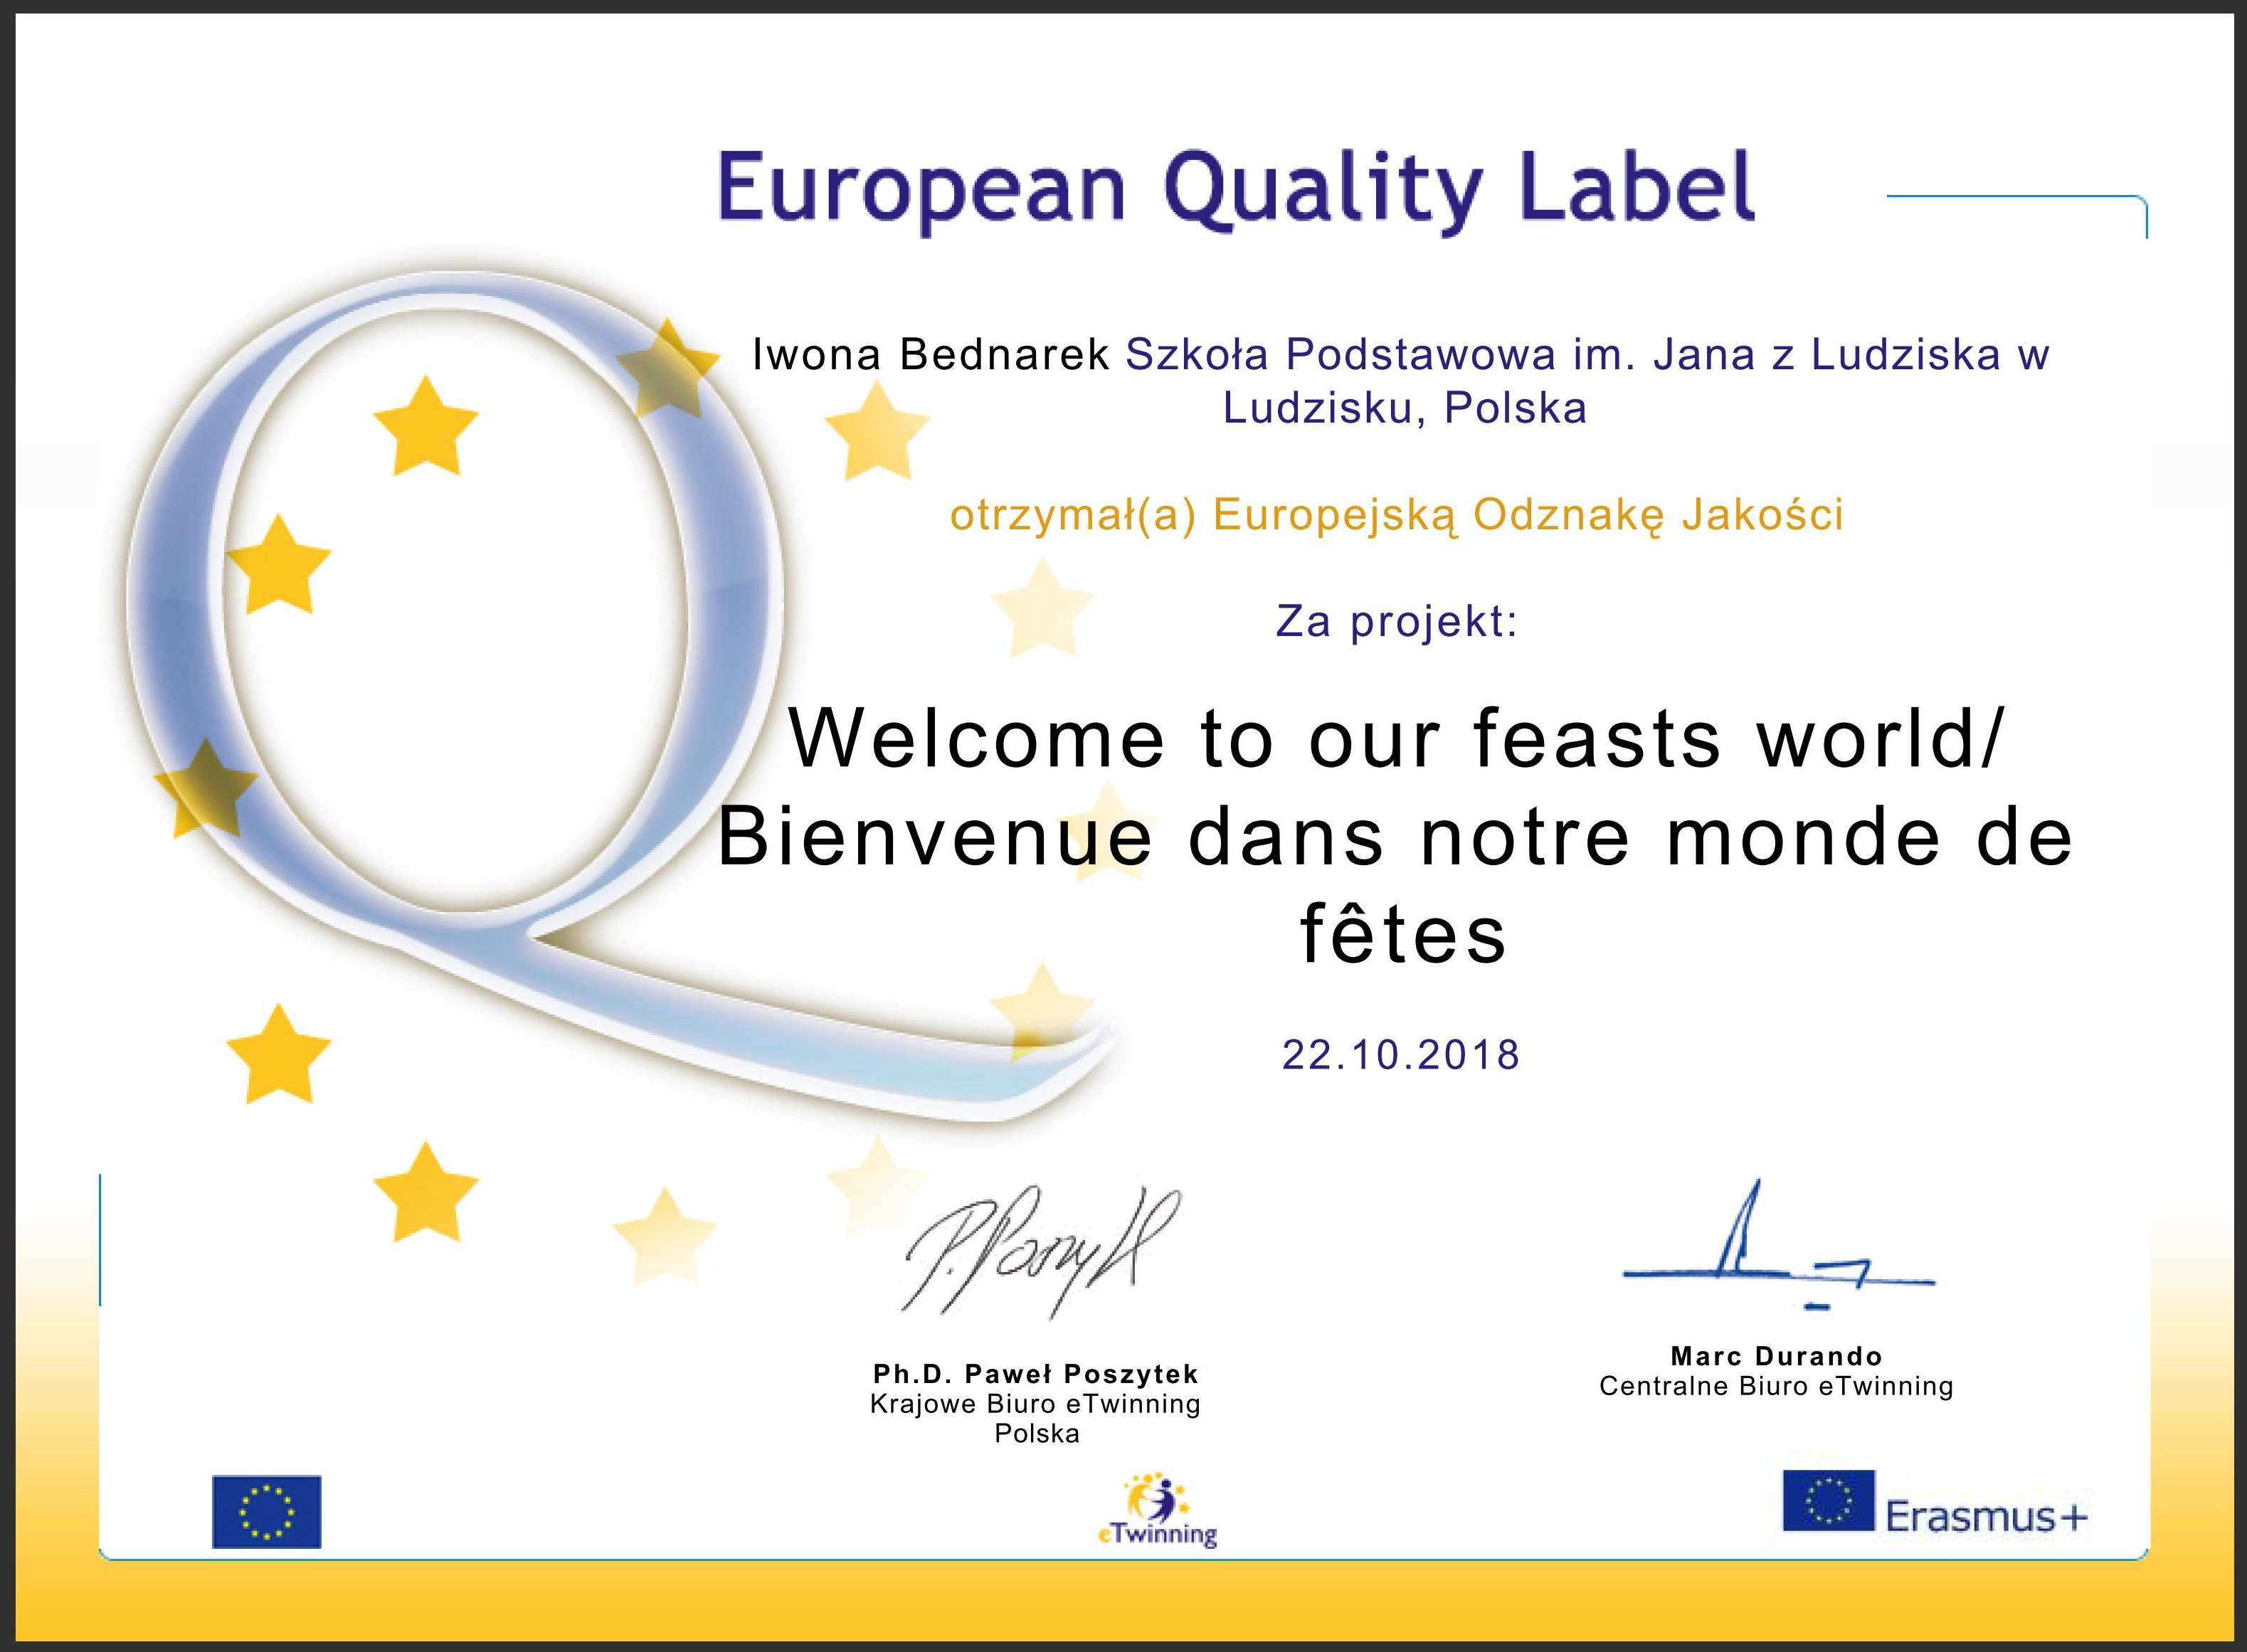 europejska_odznakajpg [3158x2322]